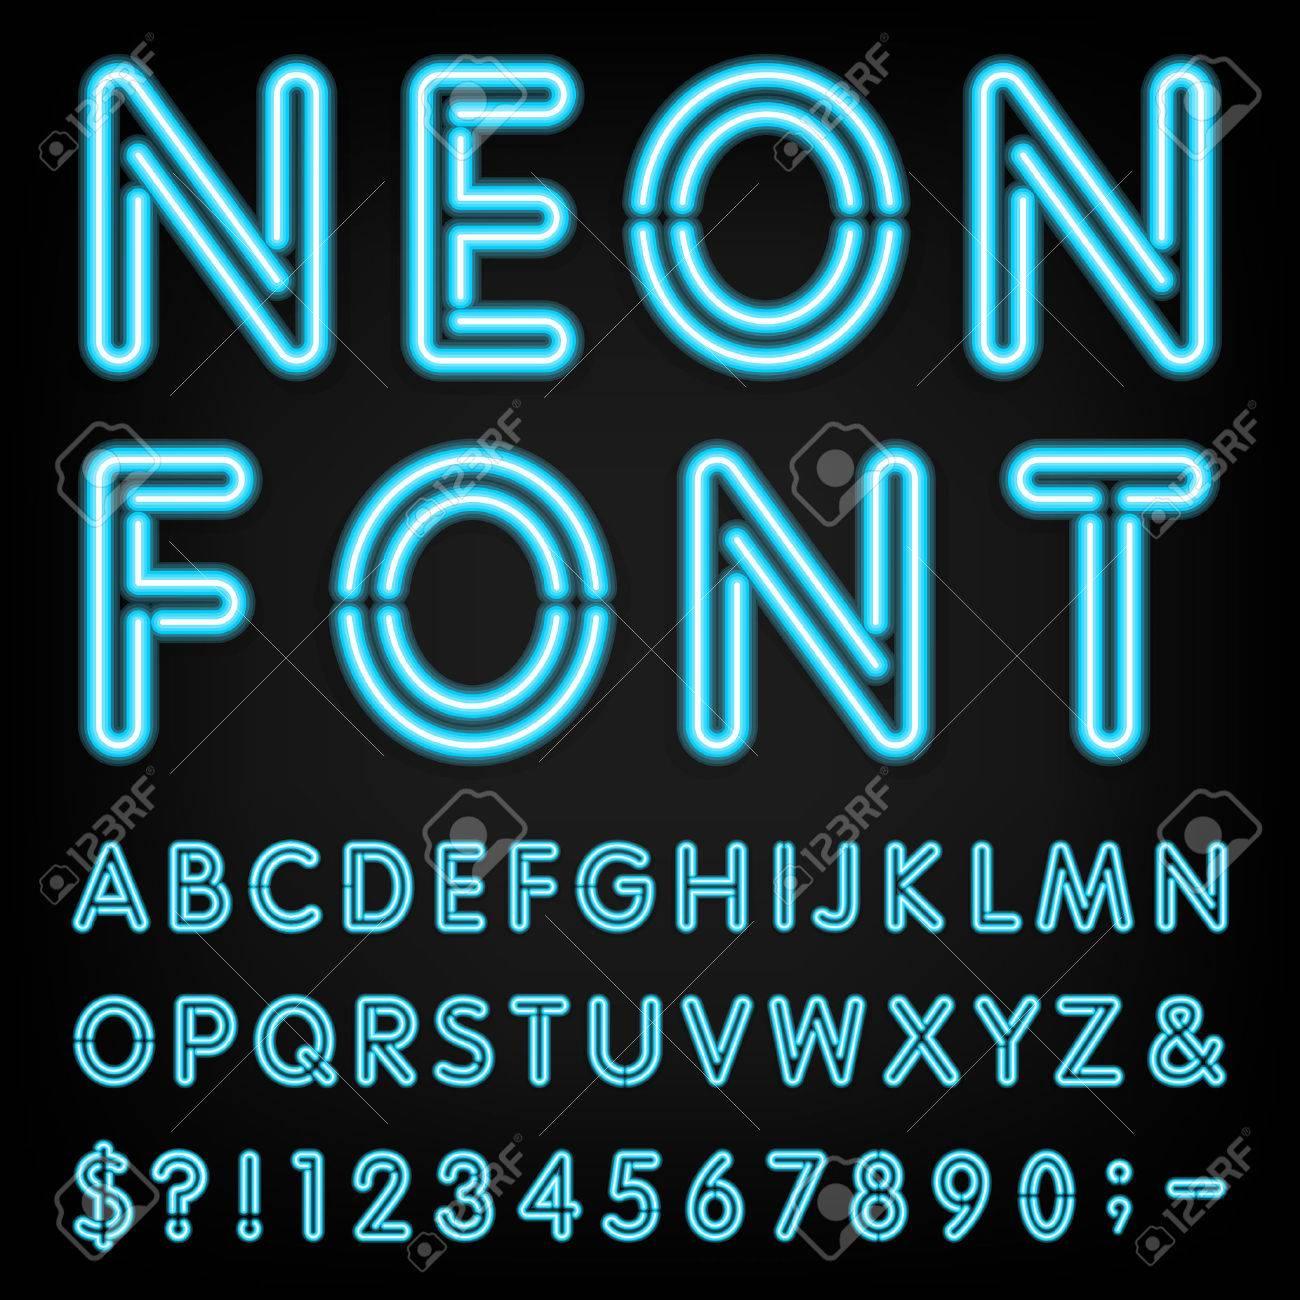 Neon Light Alphabet Font. - 40342030